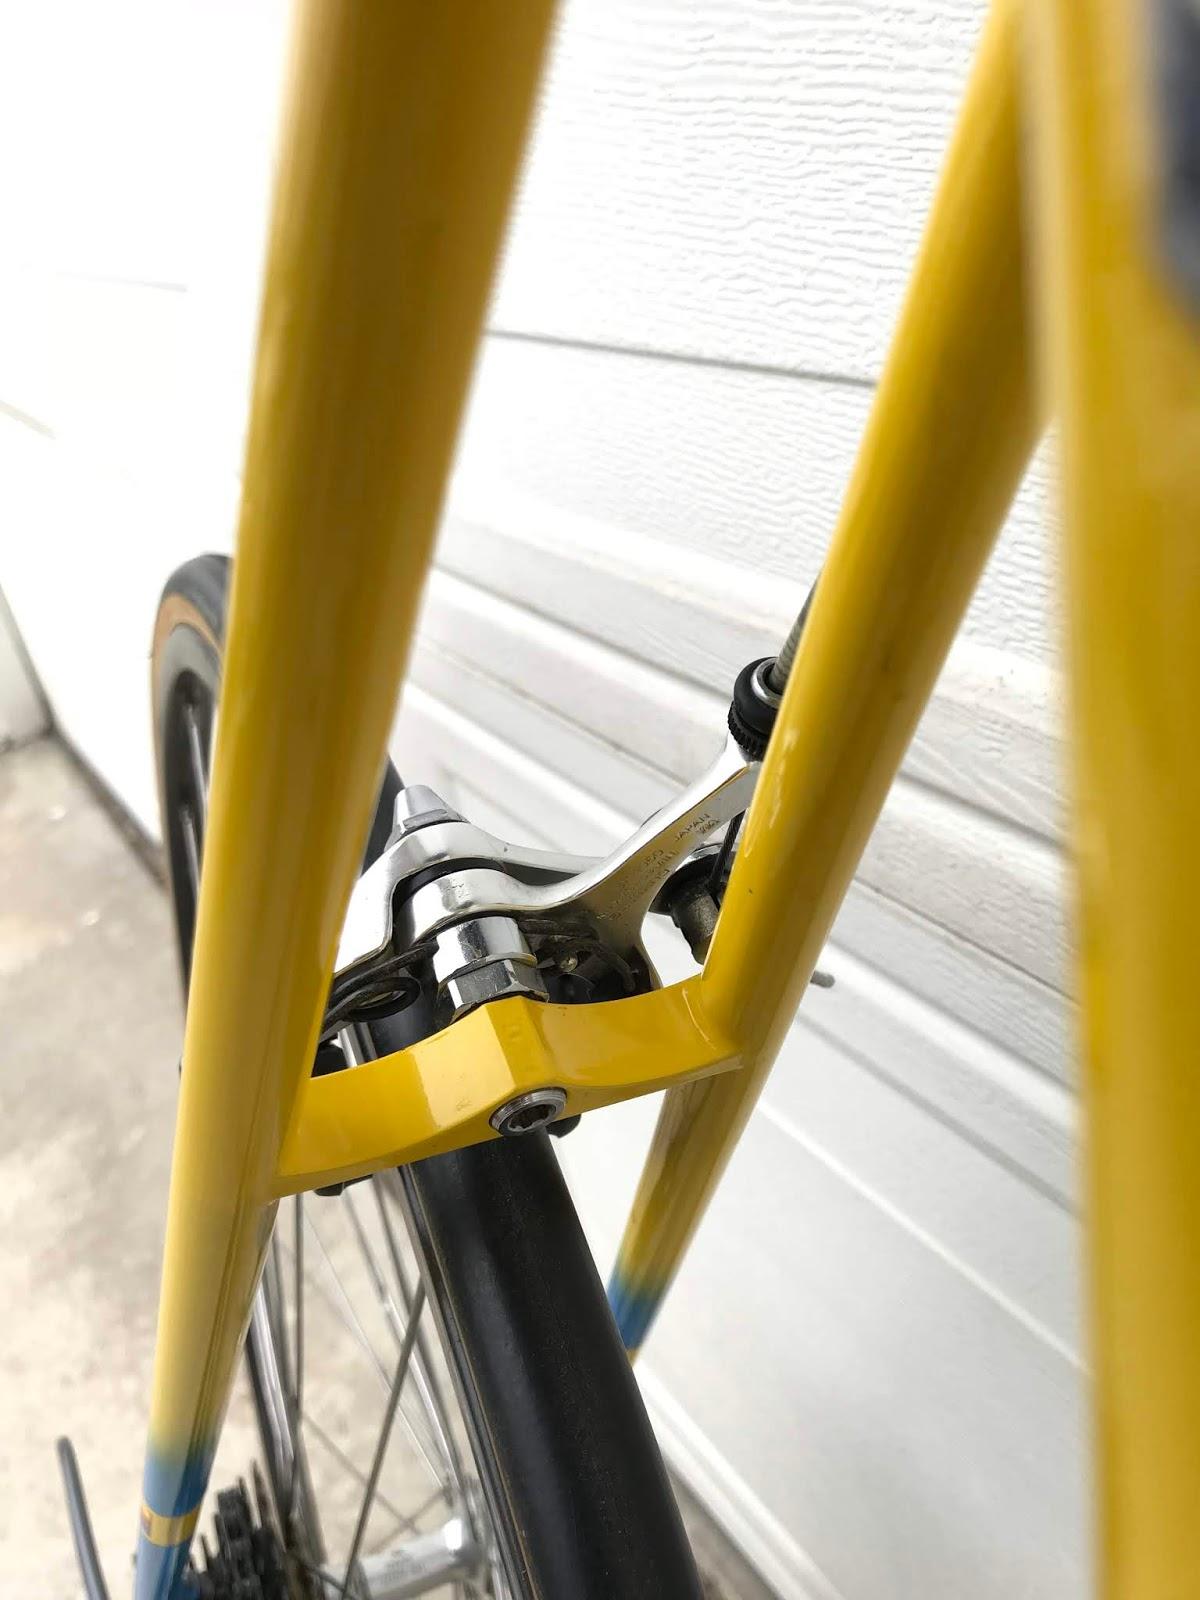 vintage racing bicycles. Black Bedroom Furniture Sets. Home Design Ideas